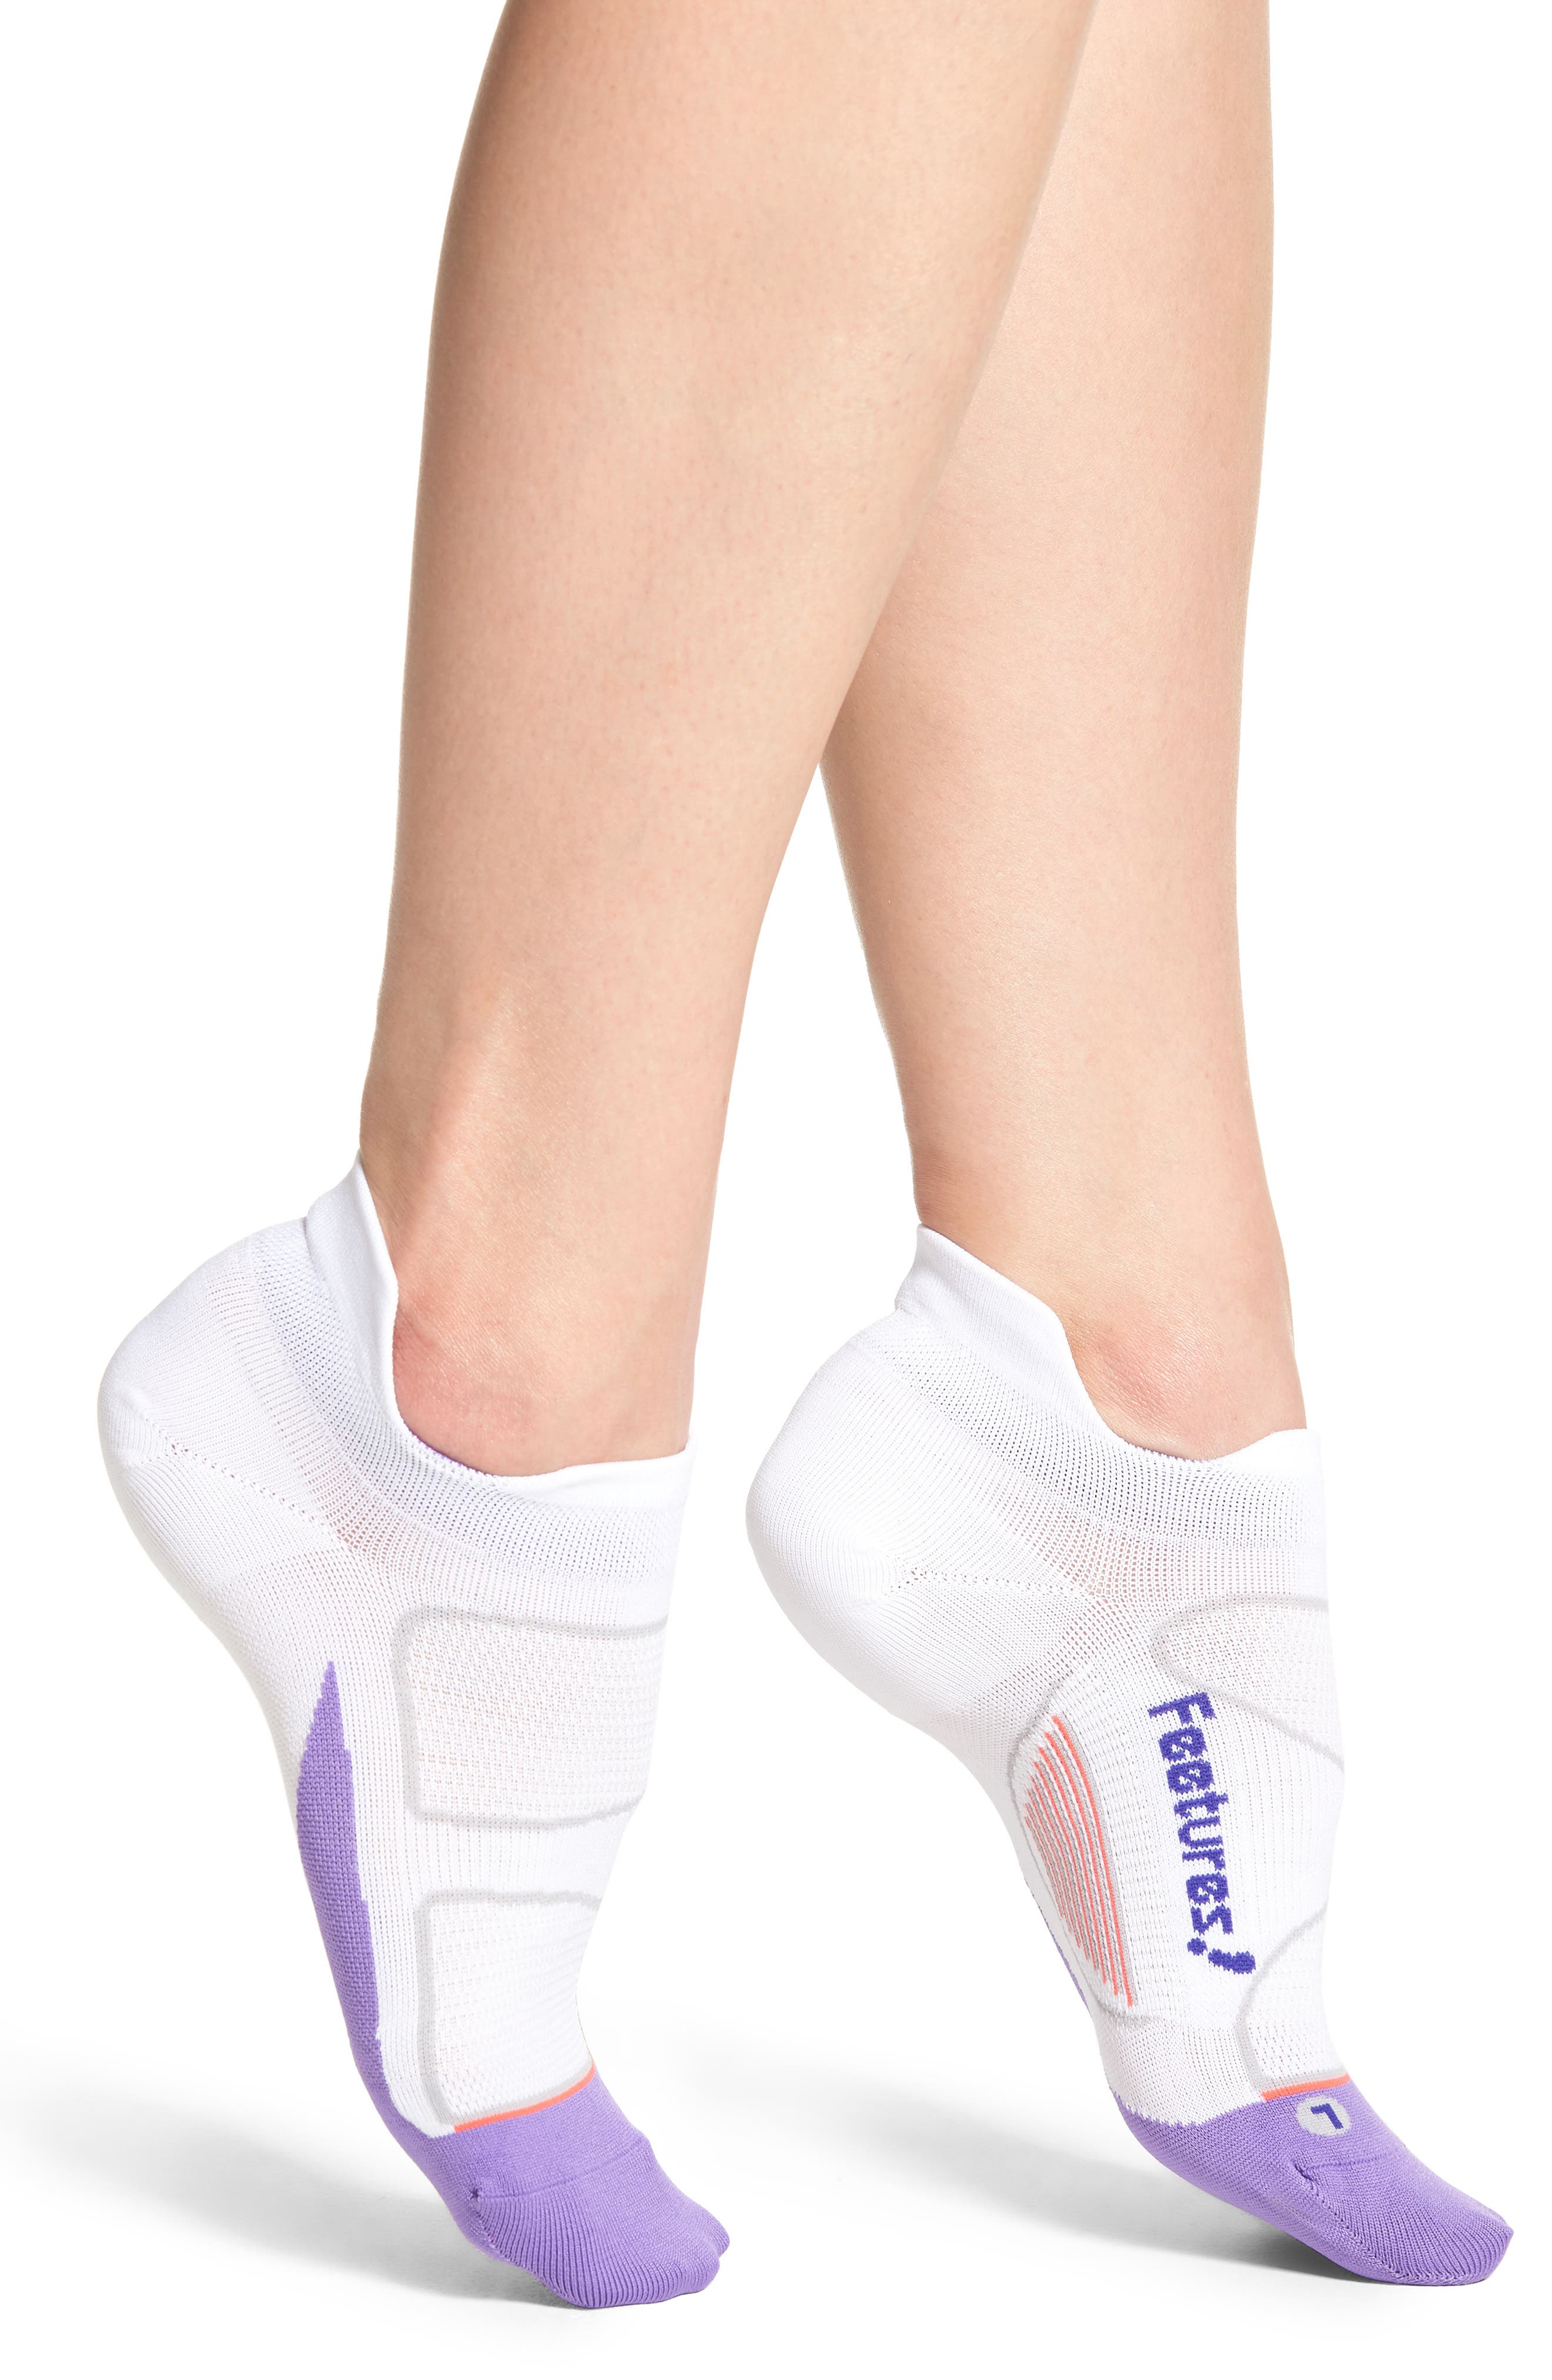 Main Image - Feetures Elite Ultra Light No-Show Running Socks